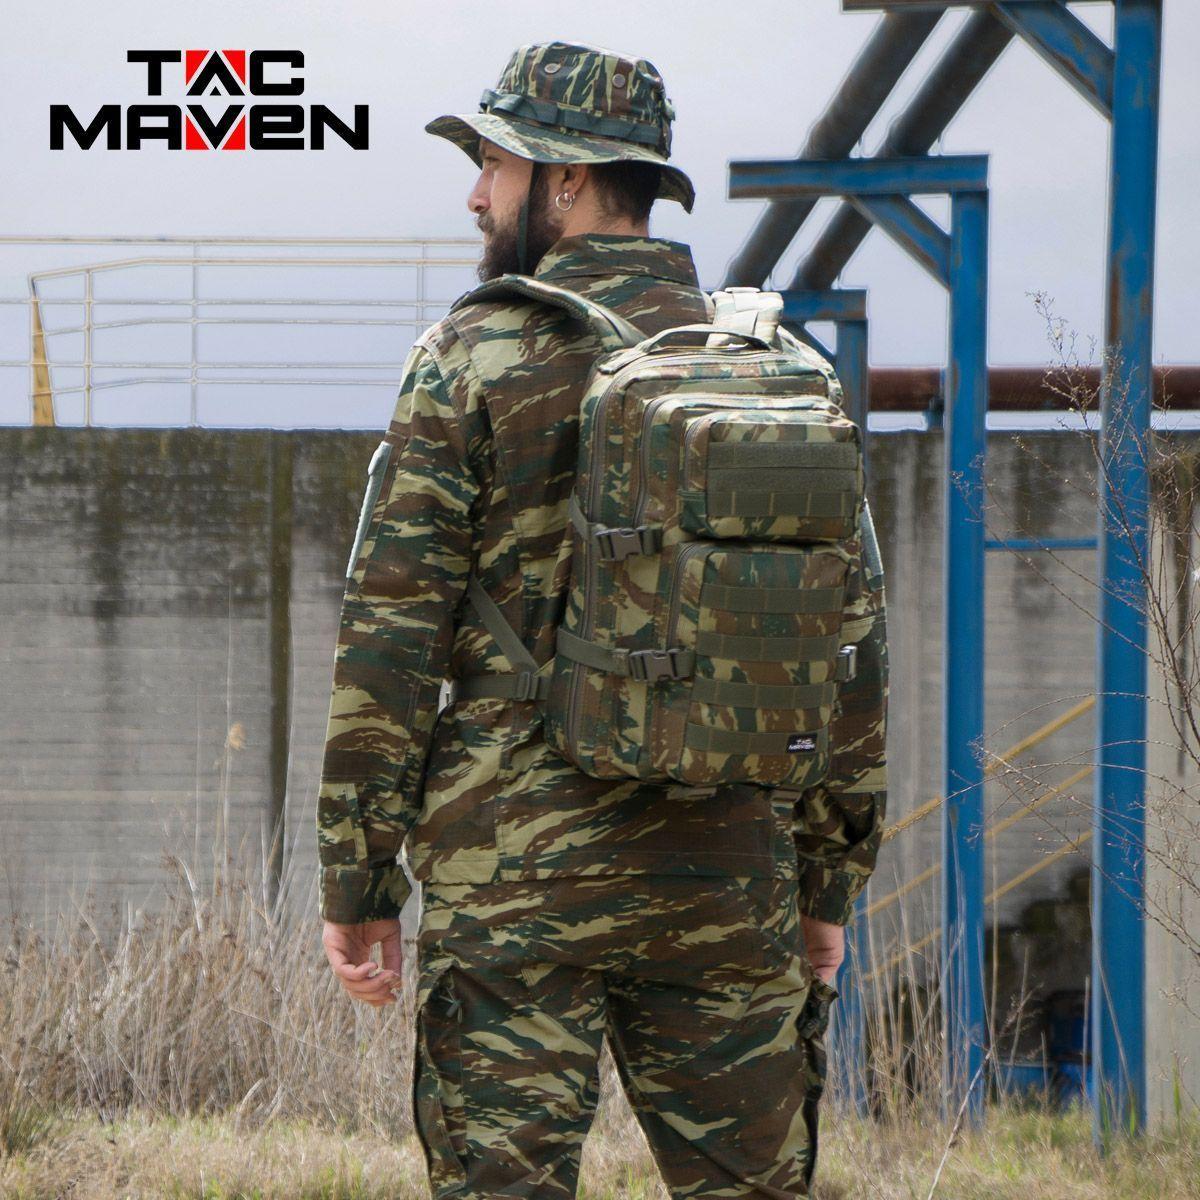 TAC MAVEN Assault Backpack Large Hiking Tactical Army Outdoor Greek Lizard Camo